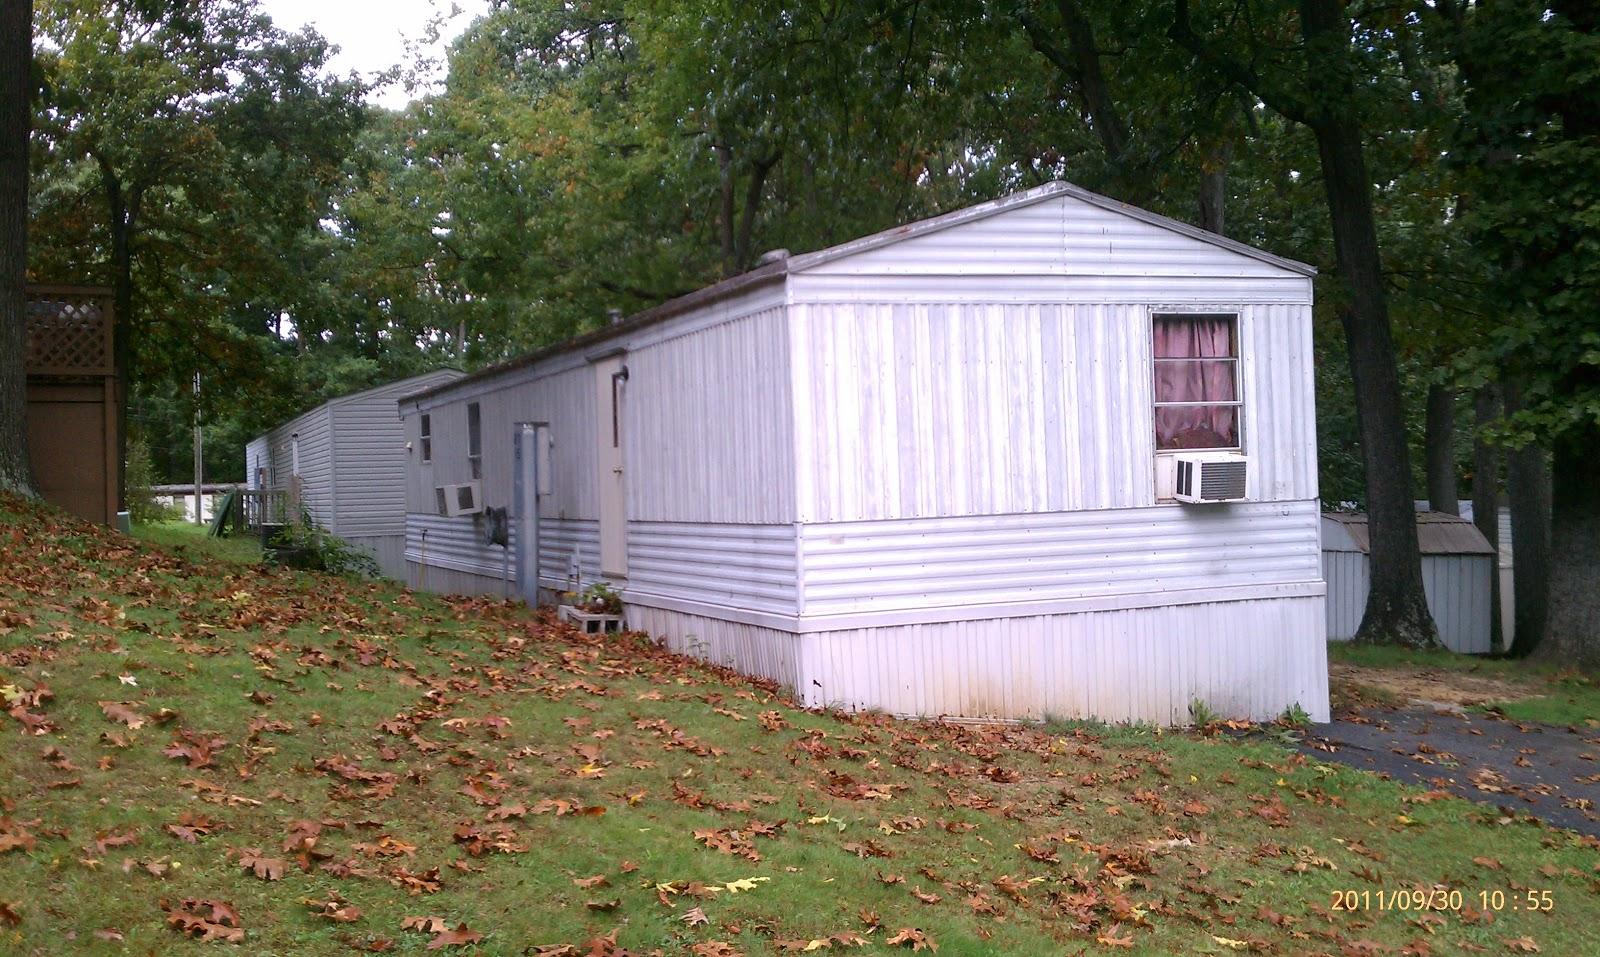 24 unique mobile homes for rent in charlottesville va